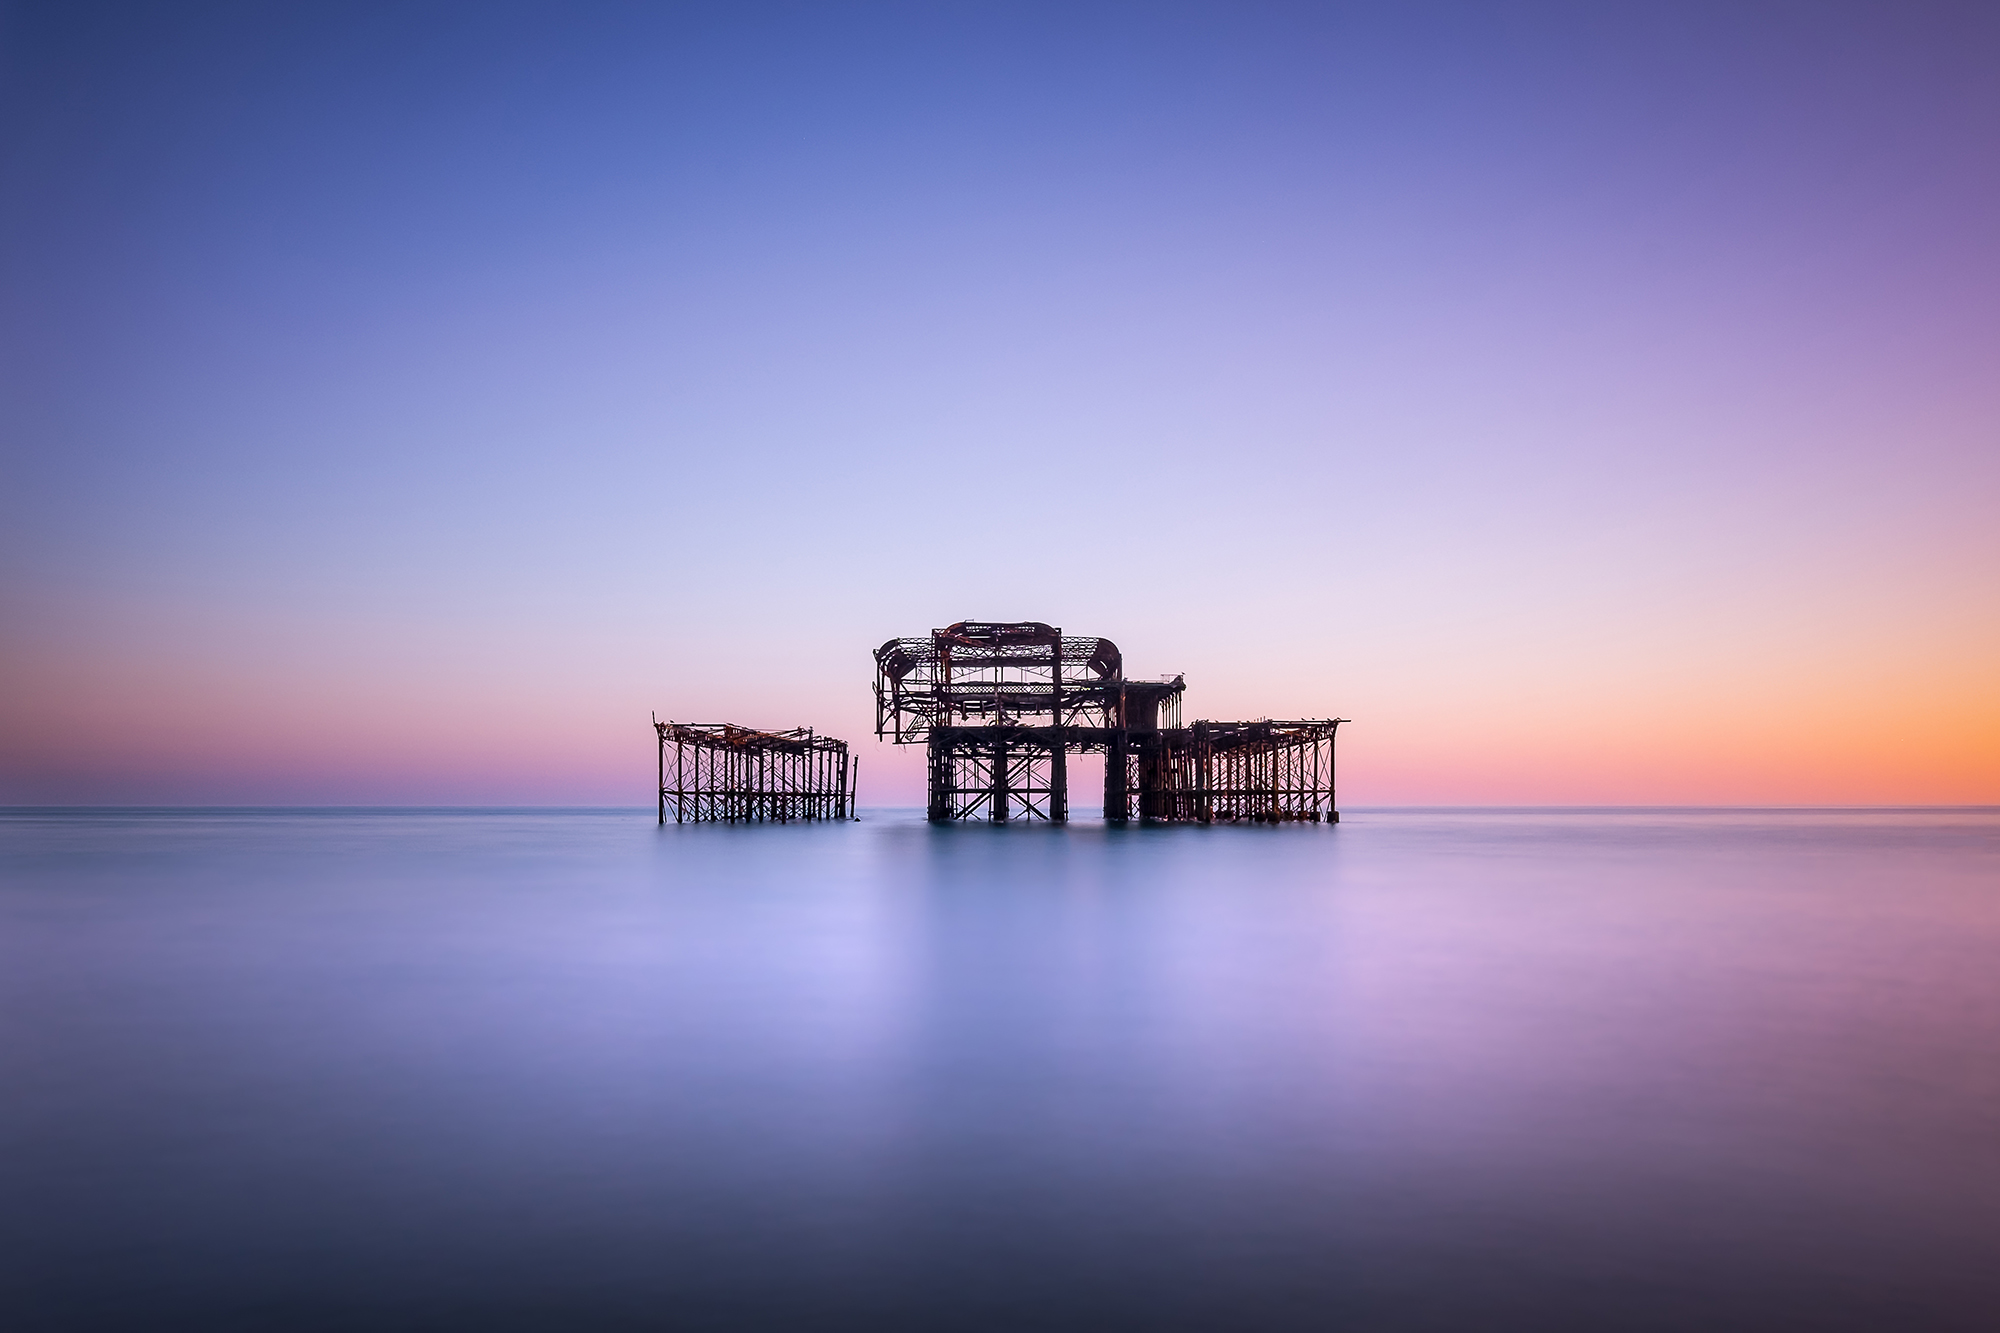 Long exposure of the West Pier in Brighton taken by Trevor Sherwin